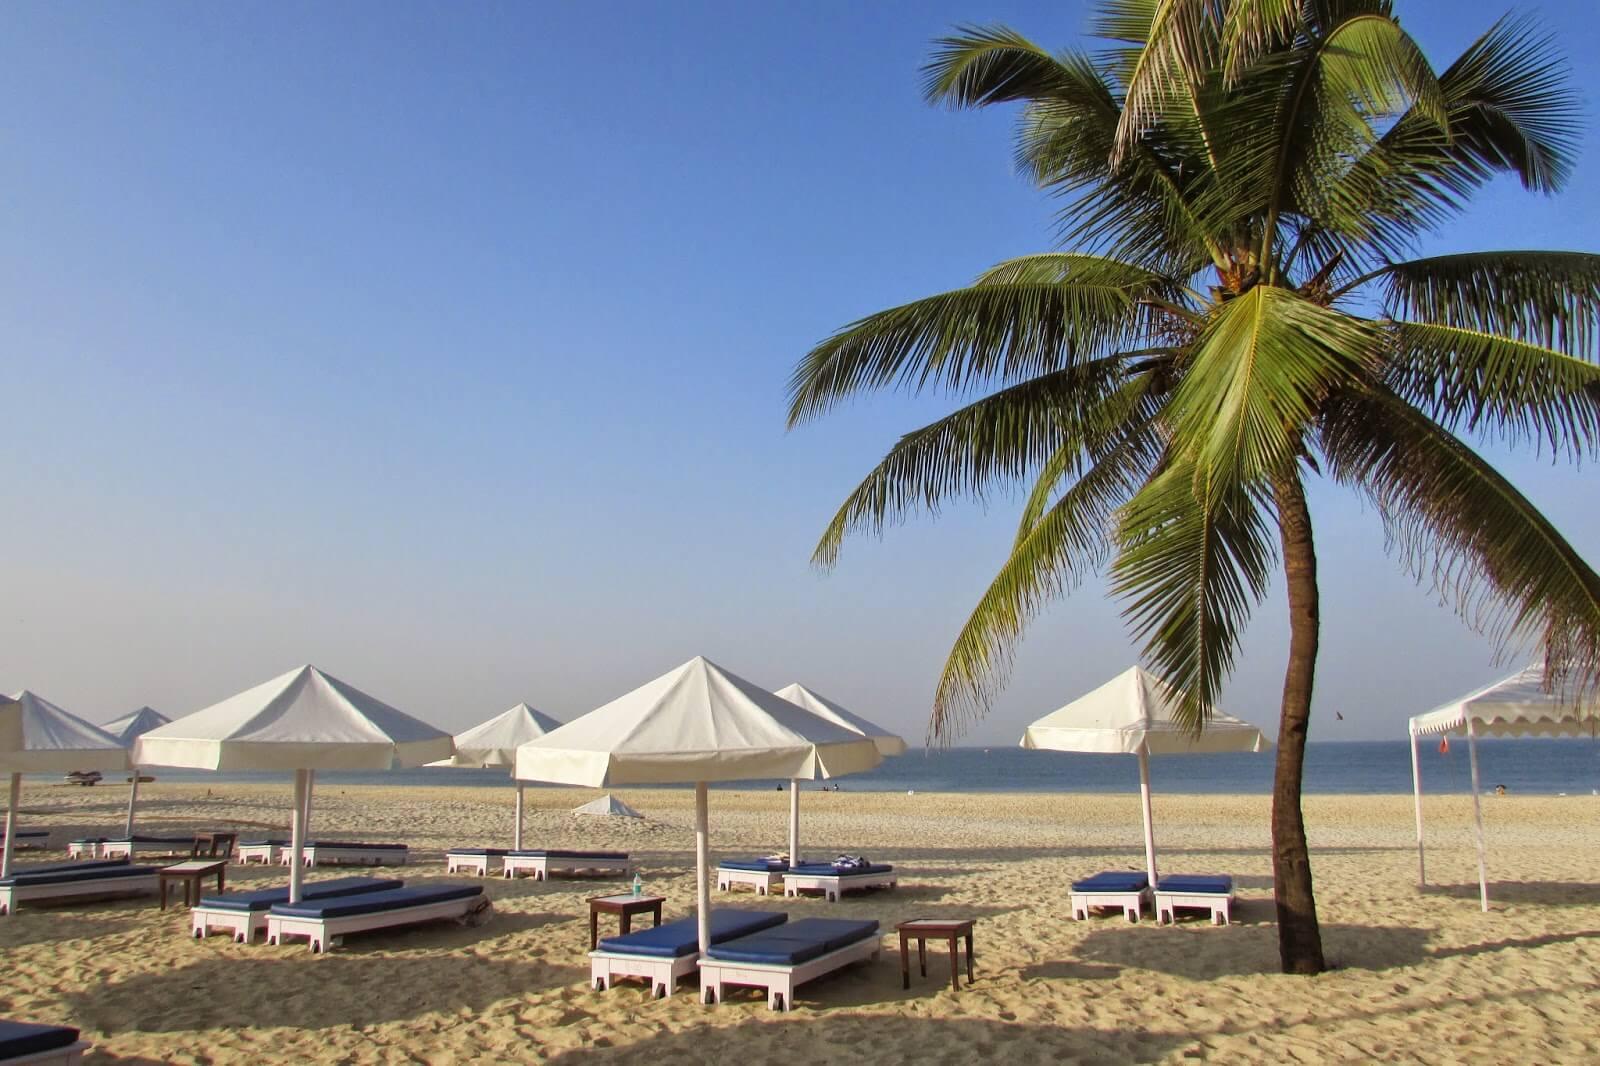 Best Beache in South Goa - Mobor Beach